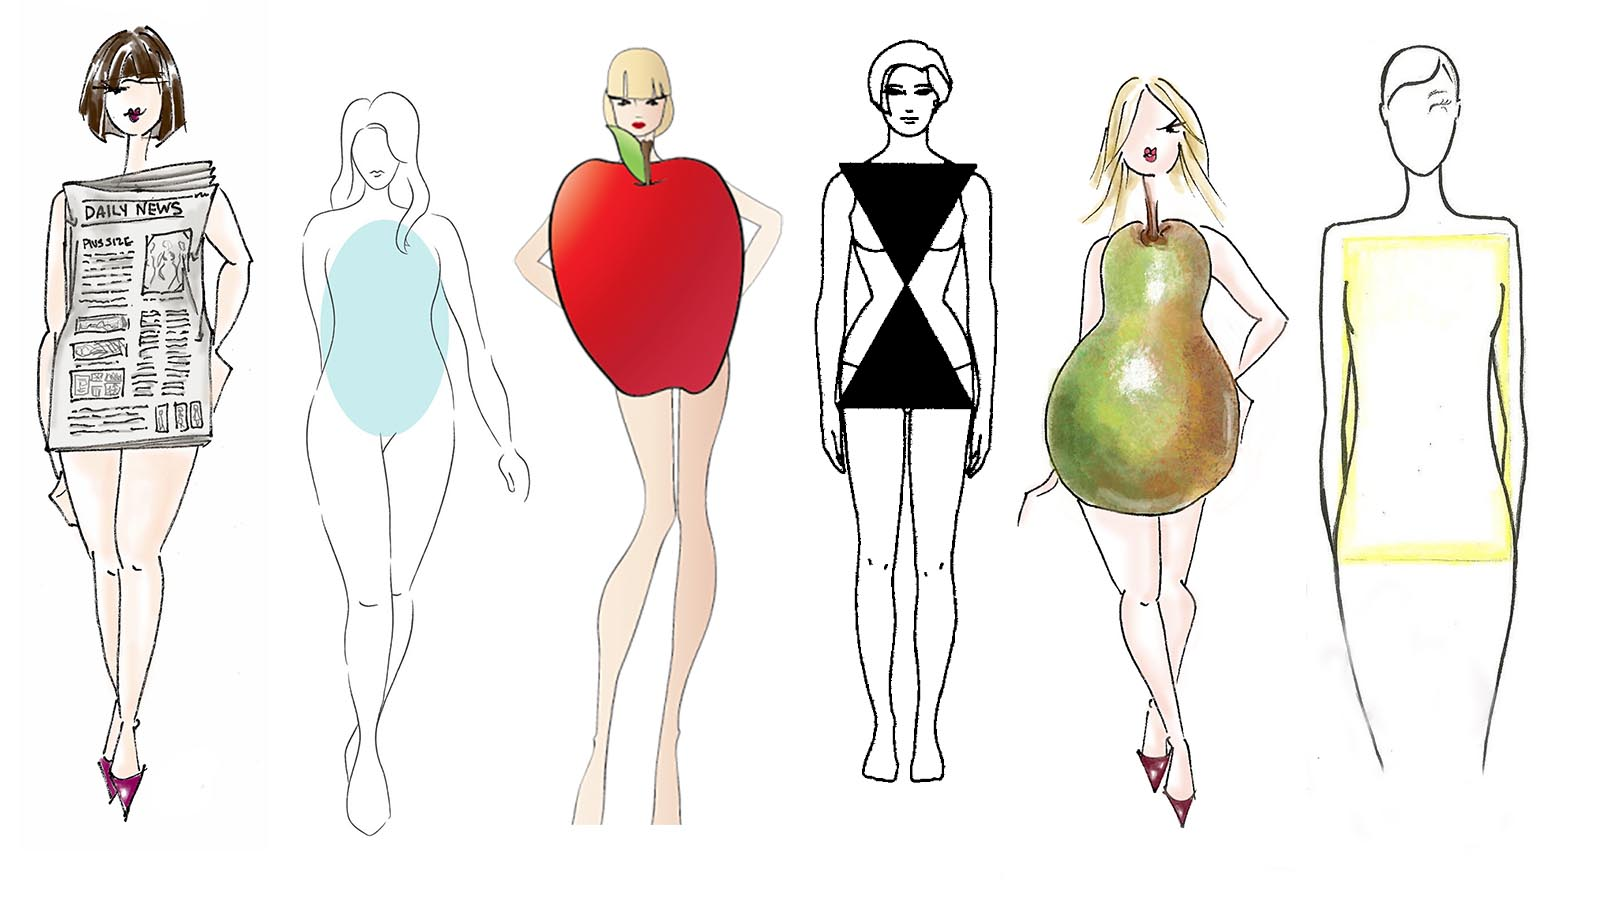 it\u0027s time we stop comparing women\u0027s body shapes to fruit \u2014 quartzit\u0027s time we stop comparing women\u0027s body shapes to fruit